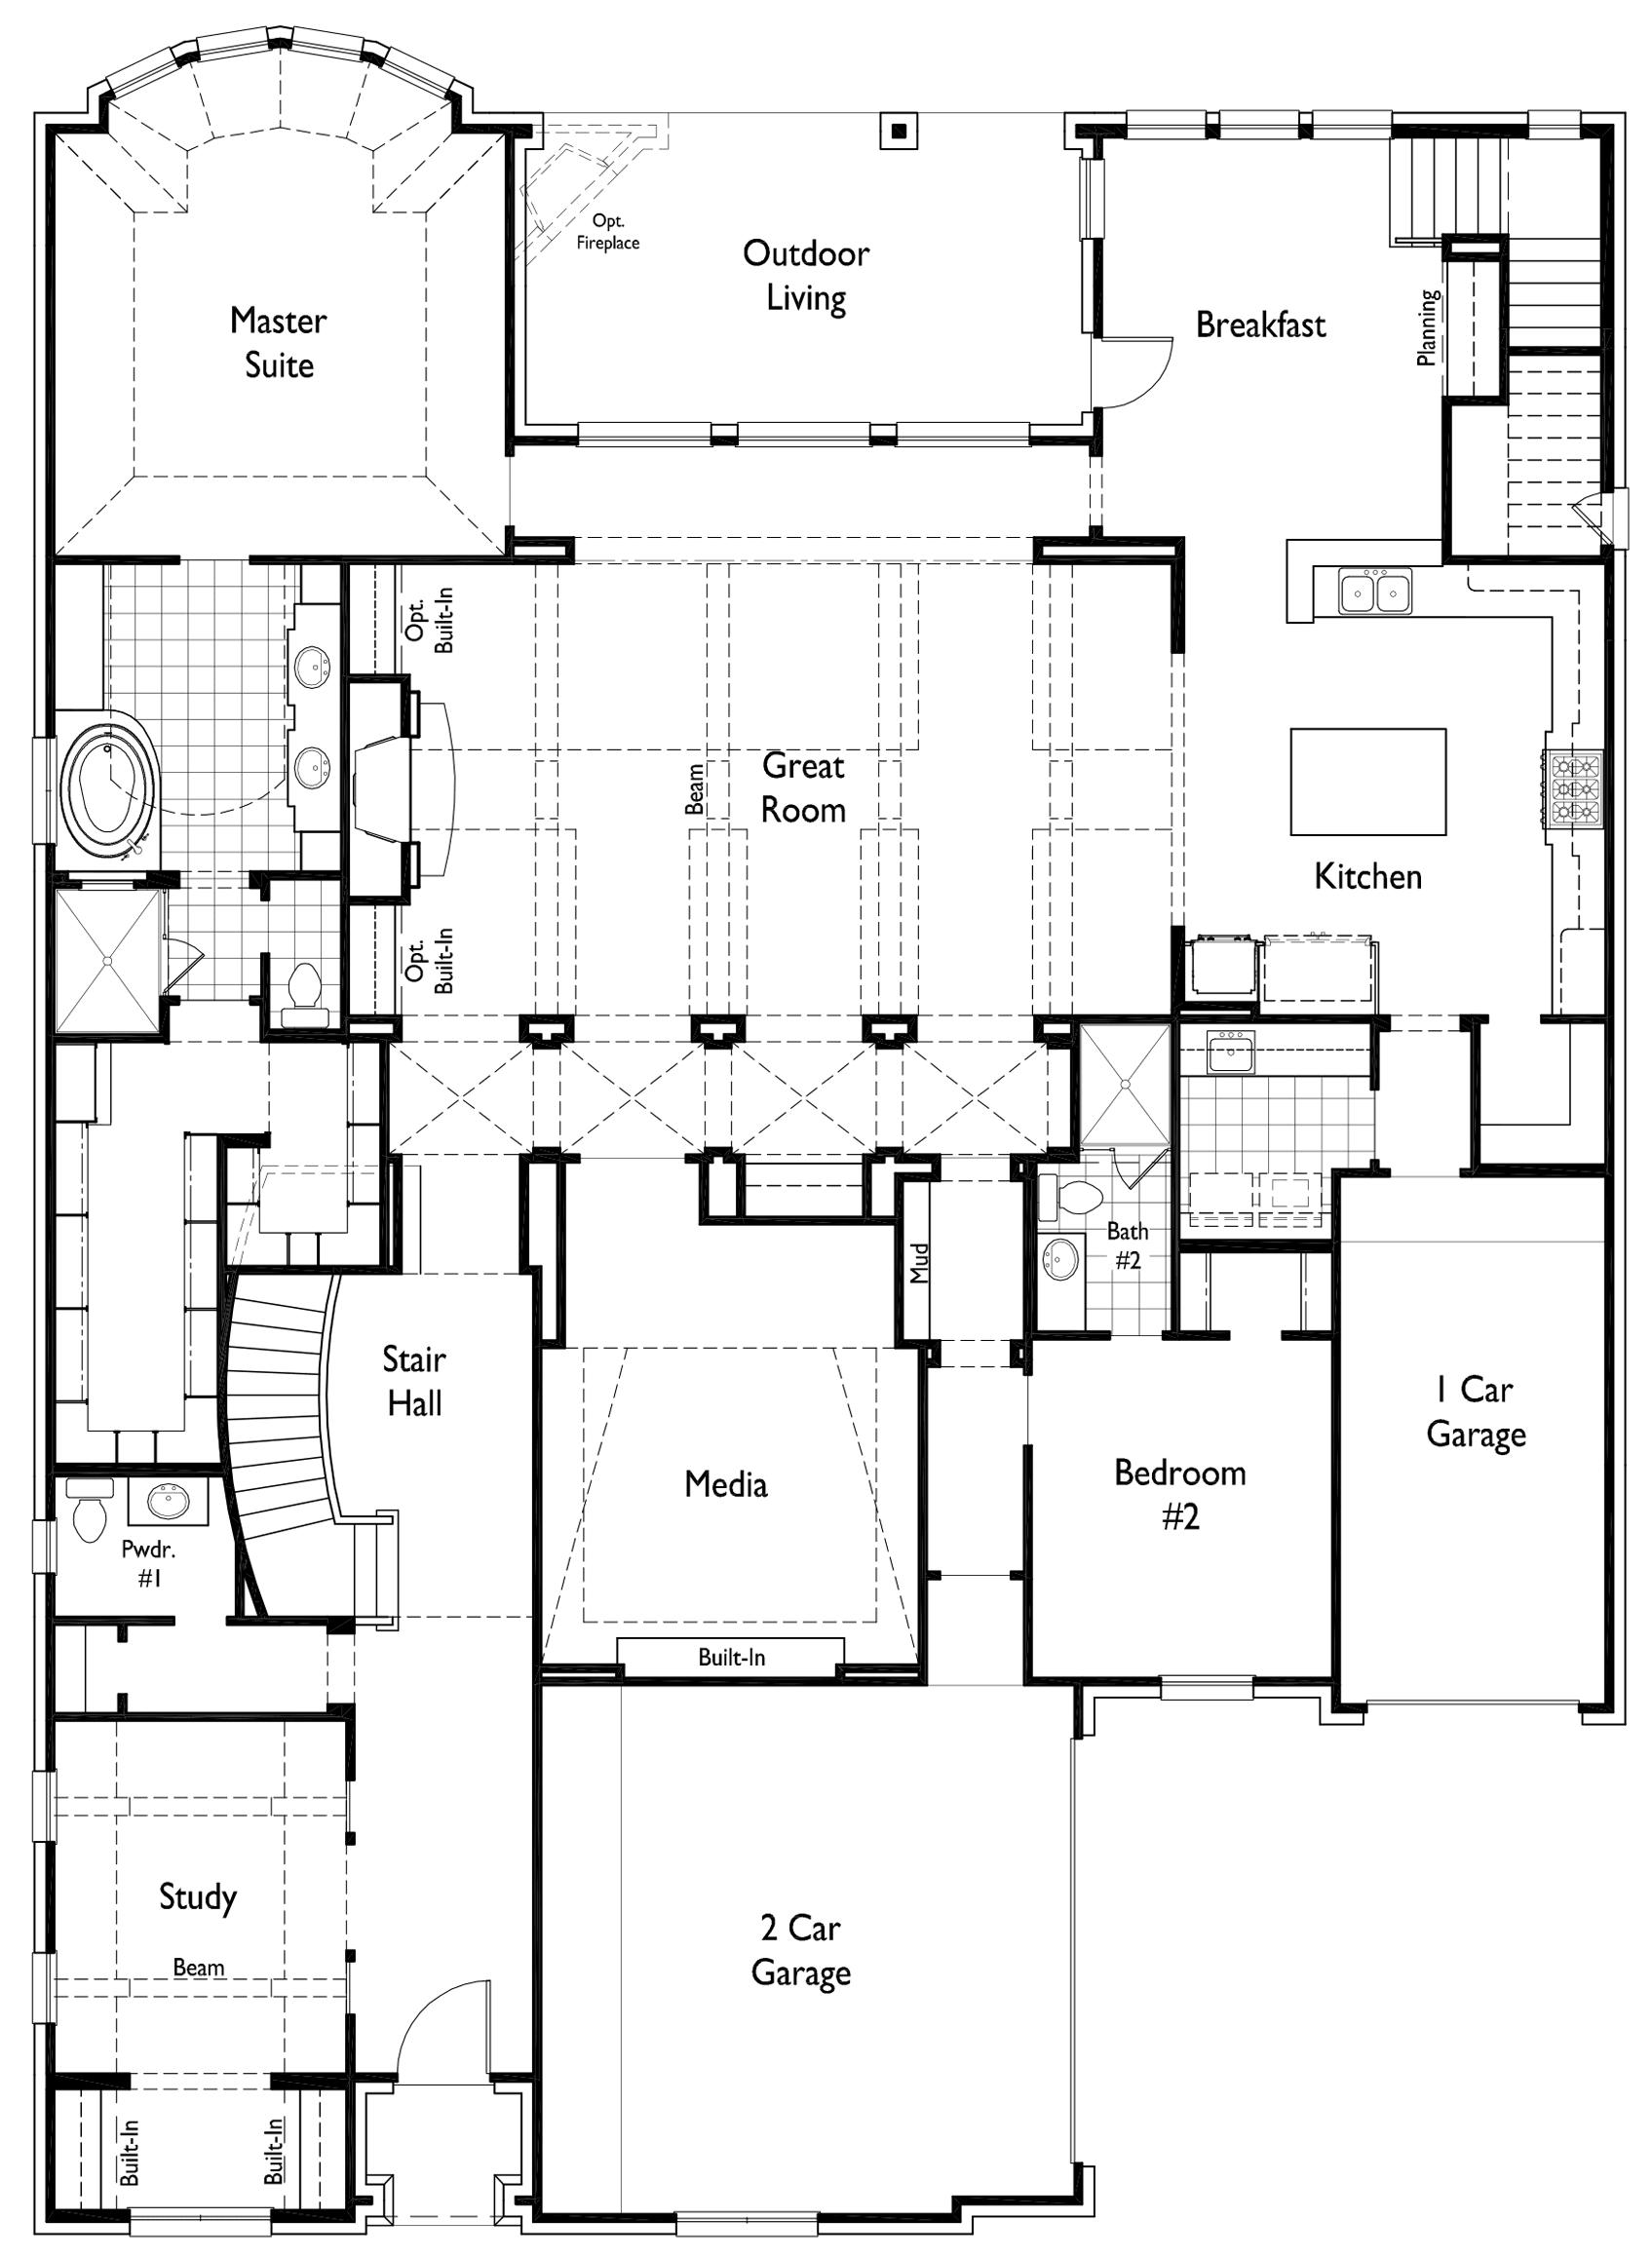 Single Family for Sale at Regency Park - Plan 6181 4012 Baldomera Street Flower Mound, Texas 75022 United States